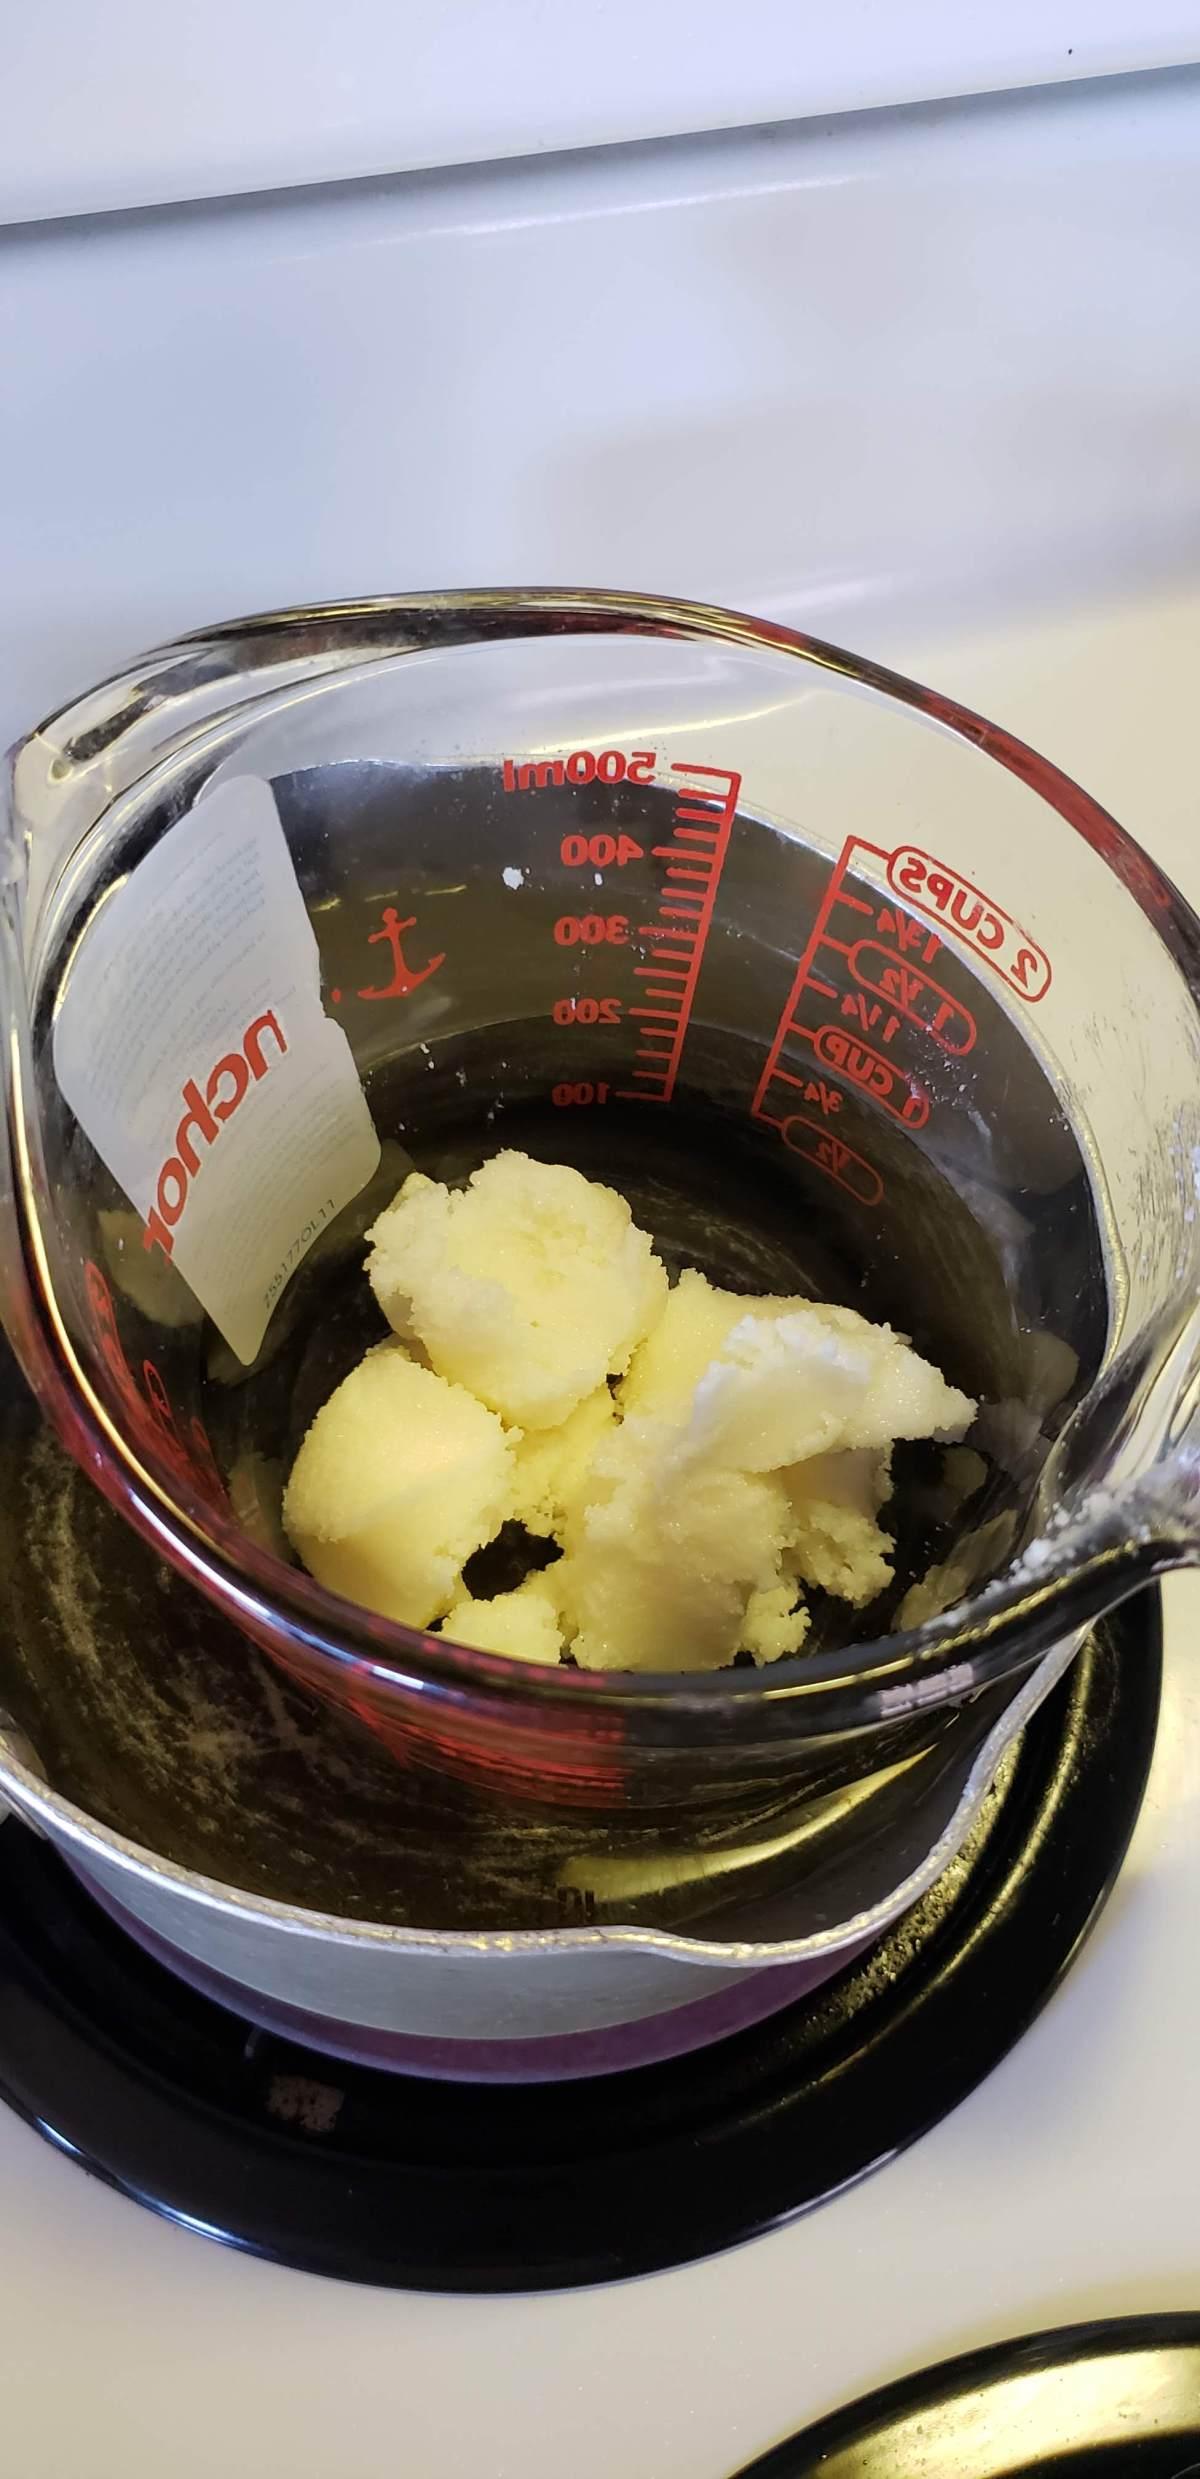 melt the shea butter and vitamin E oil